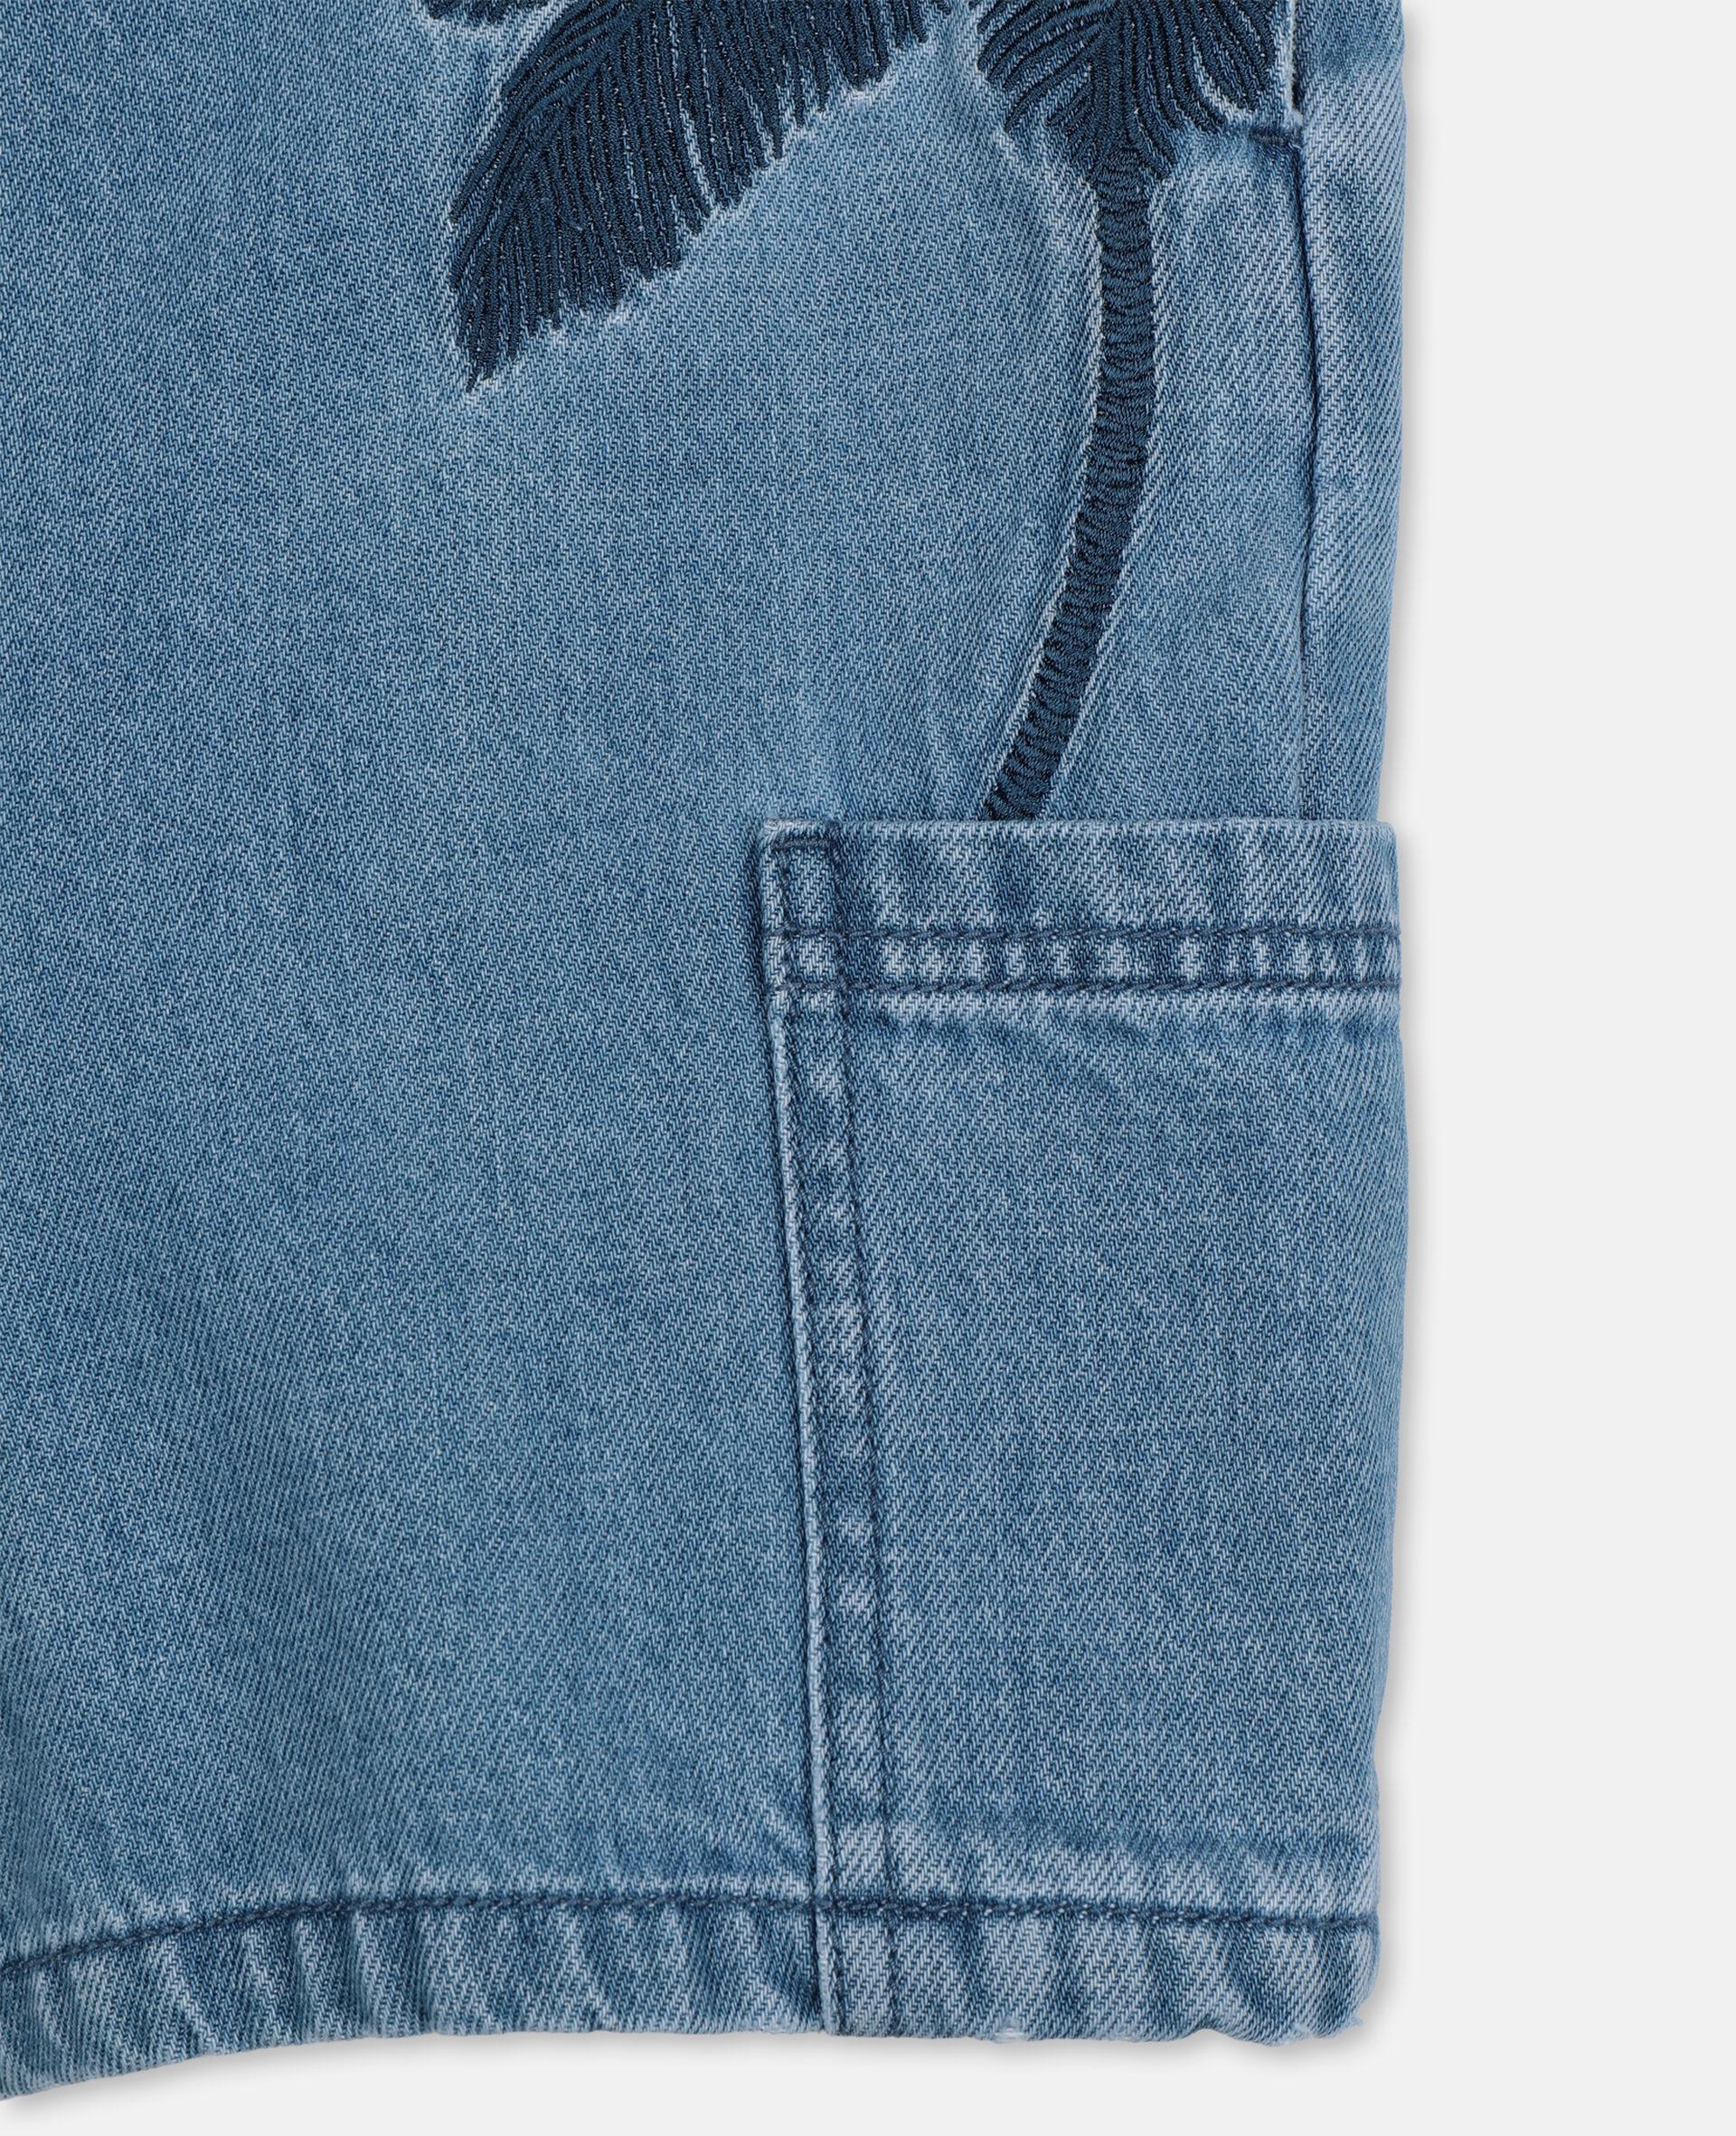 Embroidered Palms Denim Dungaree-Blue-large image number 1